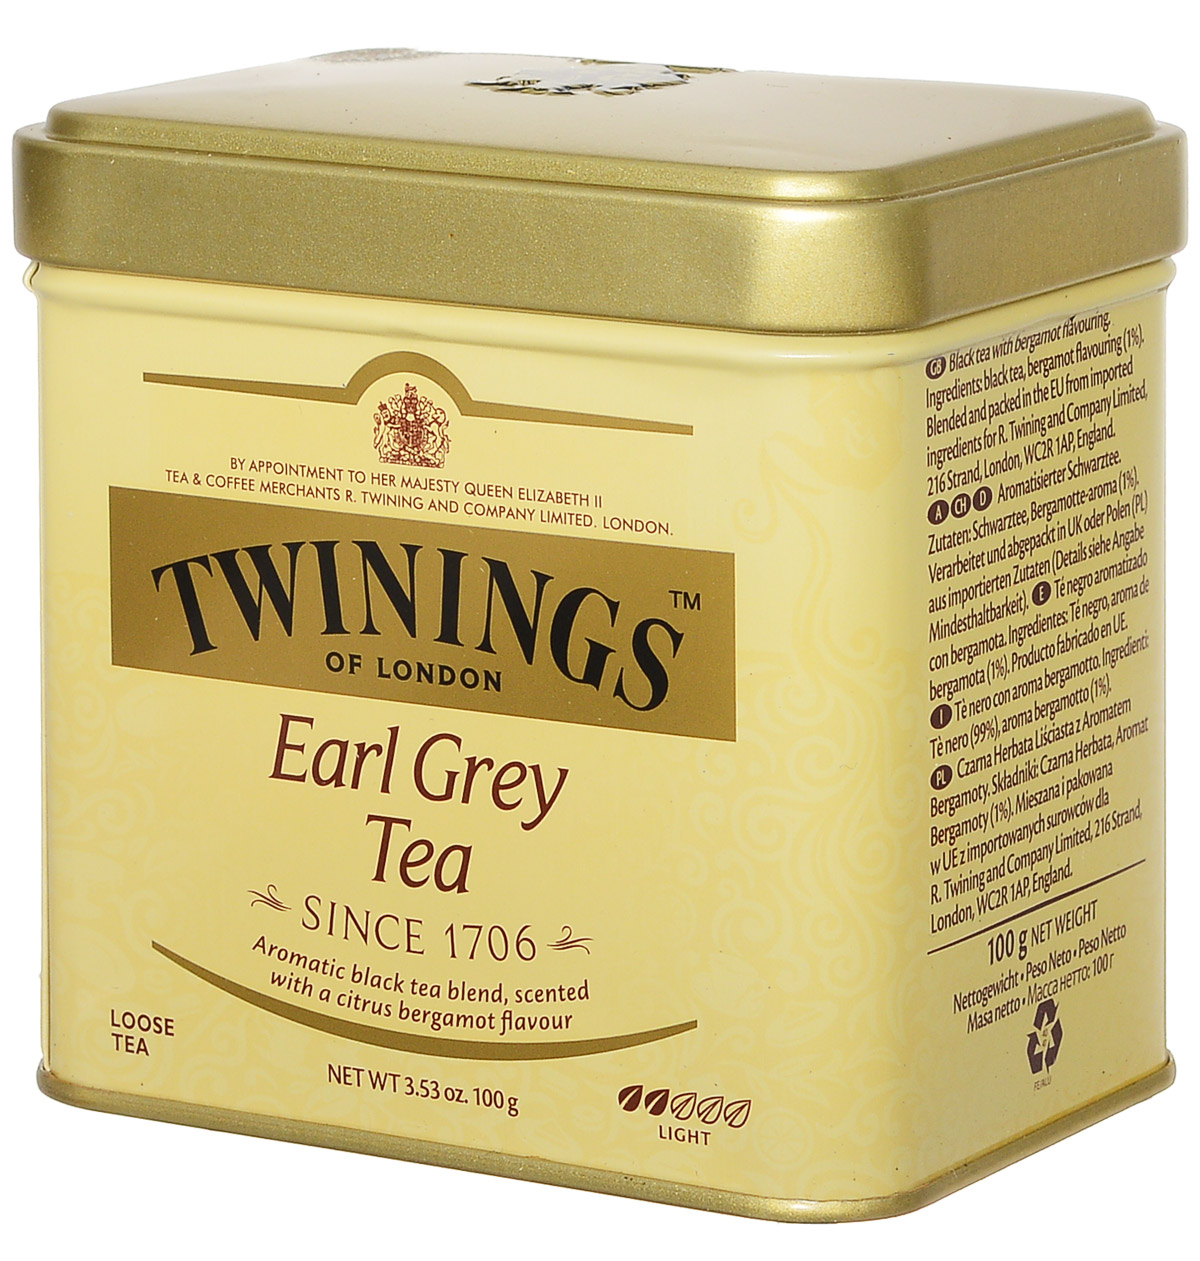 Twinings Earl Grey Tea черный ароматизированный листовой чай, 100 г (ж/б) jaf tea earl grey classic чай черный листовой с ароматом бергамота 100 г